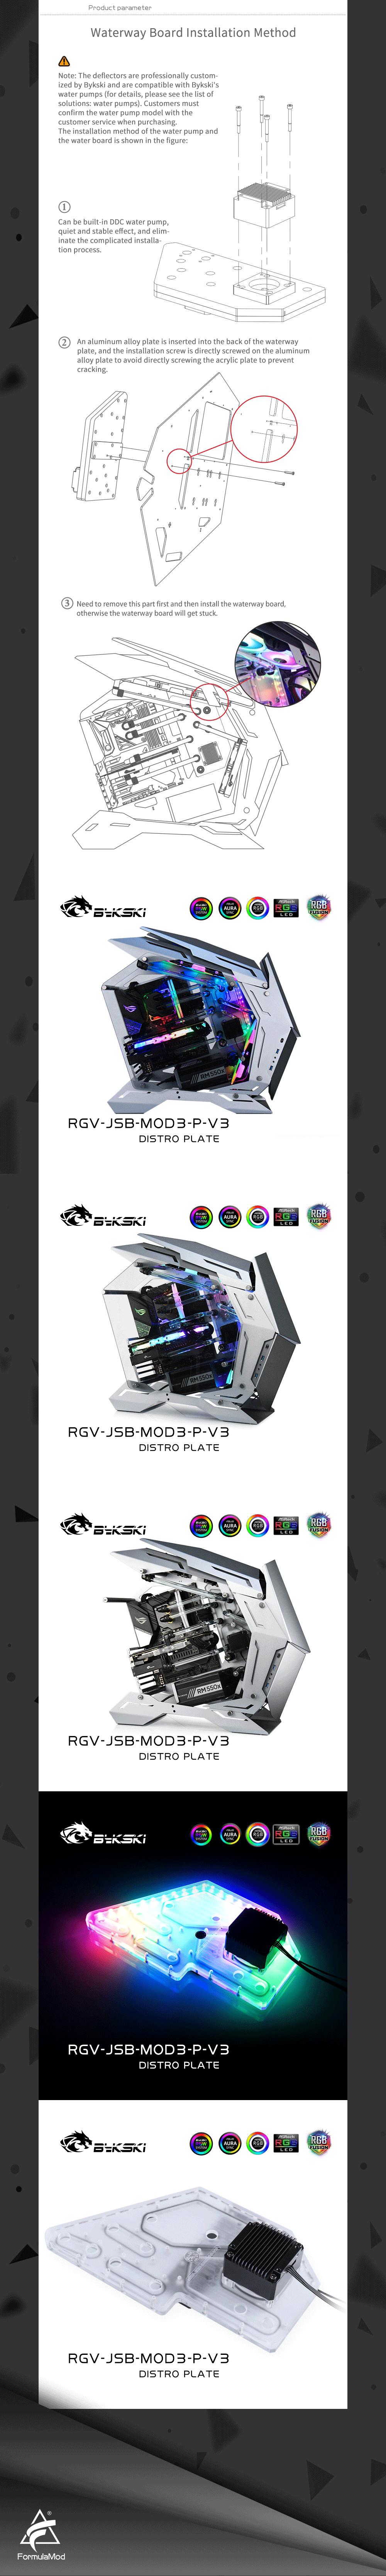 Bykski RGV-JSB-MOD3-P-V3 Waterway Boards For JONSBO MOD3 Case, Bykski RBW For Intel CPU Water Block & Single GPU Building